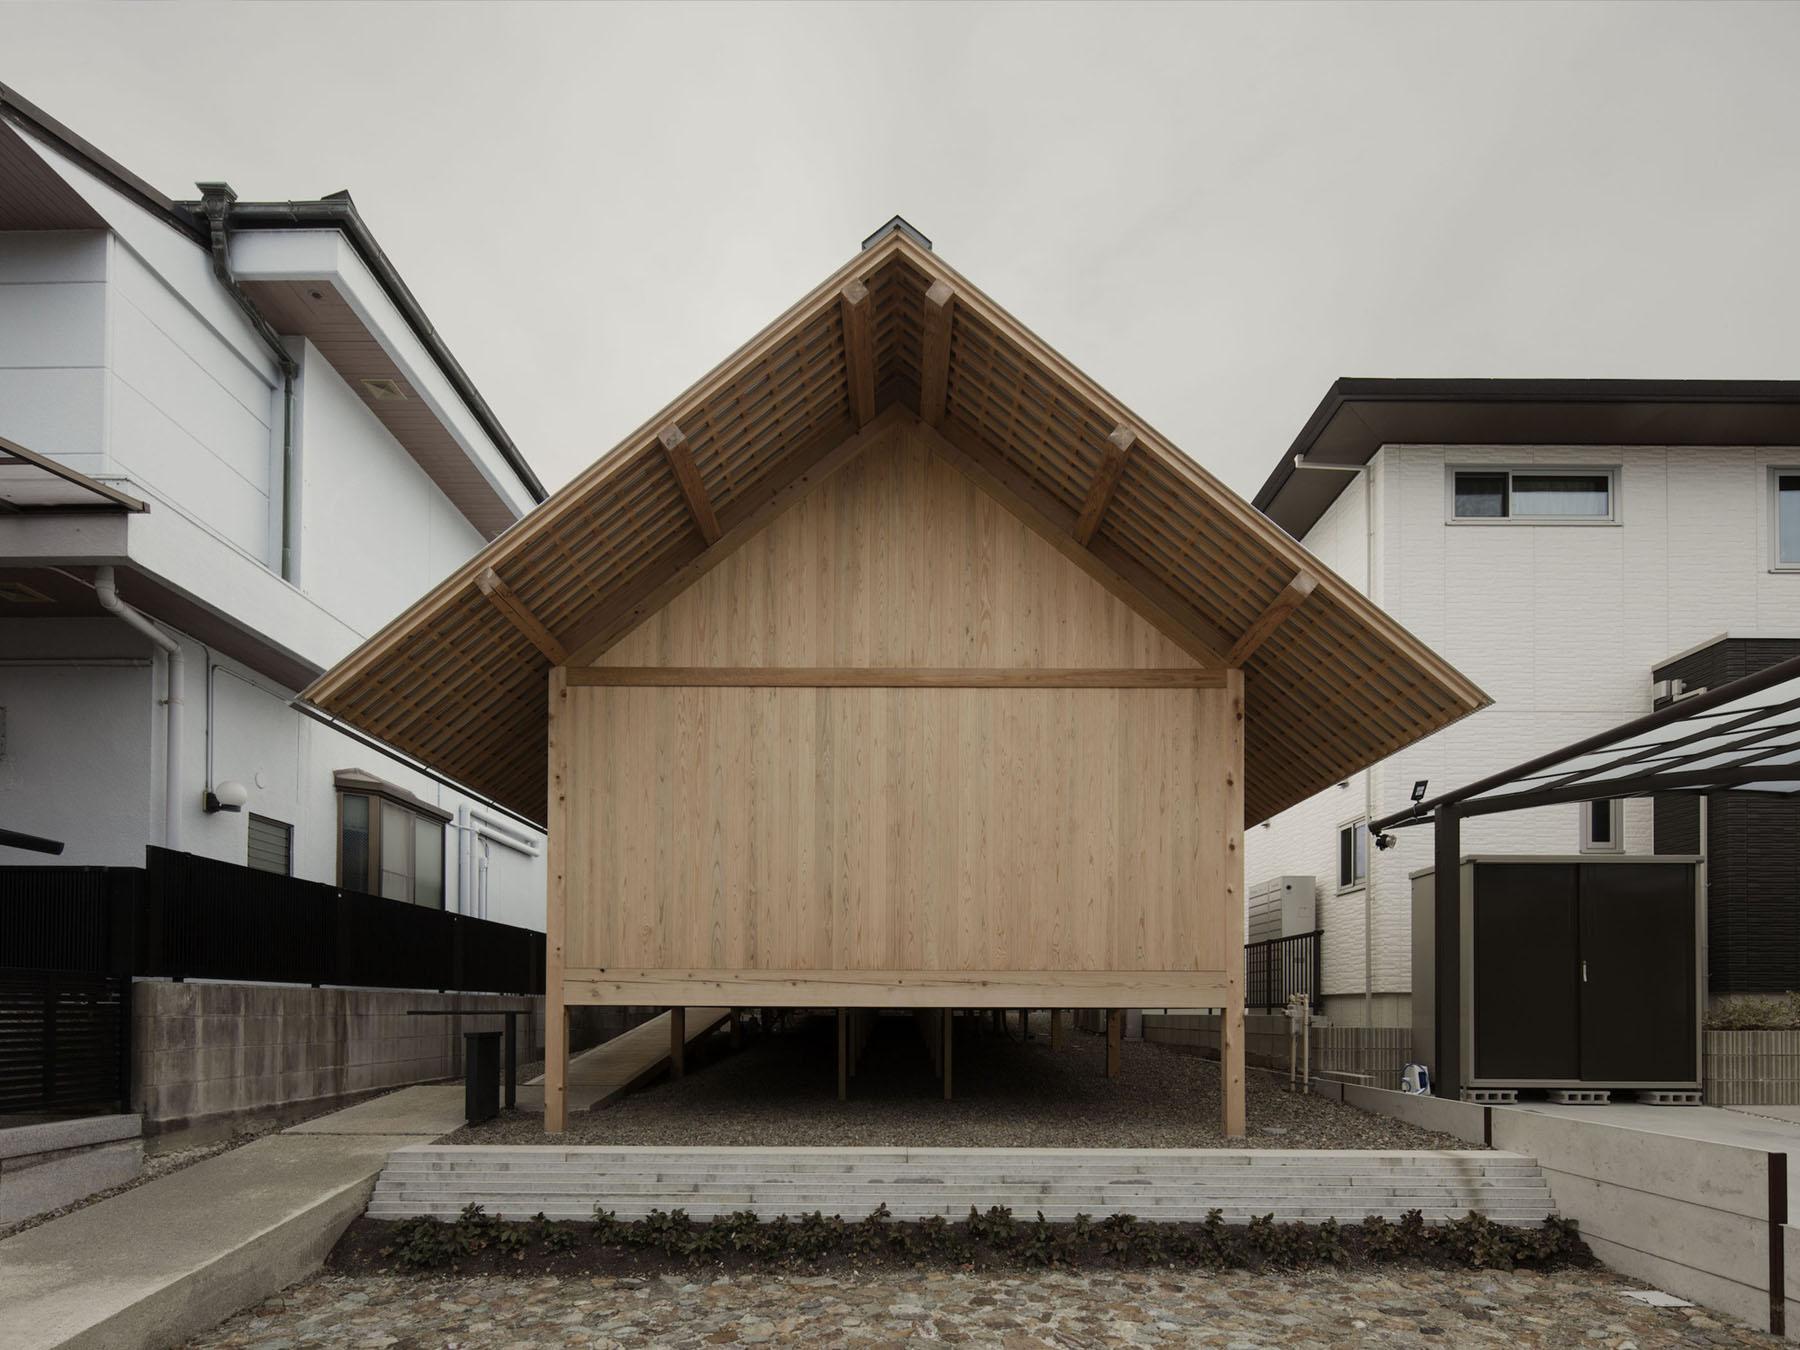 Yomogidai House by Tomoaki Uno Architects